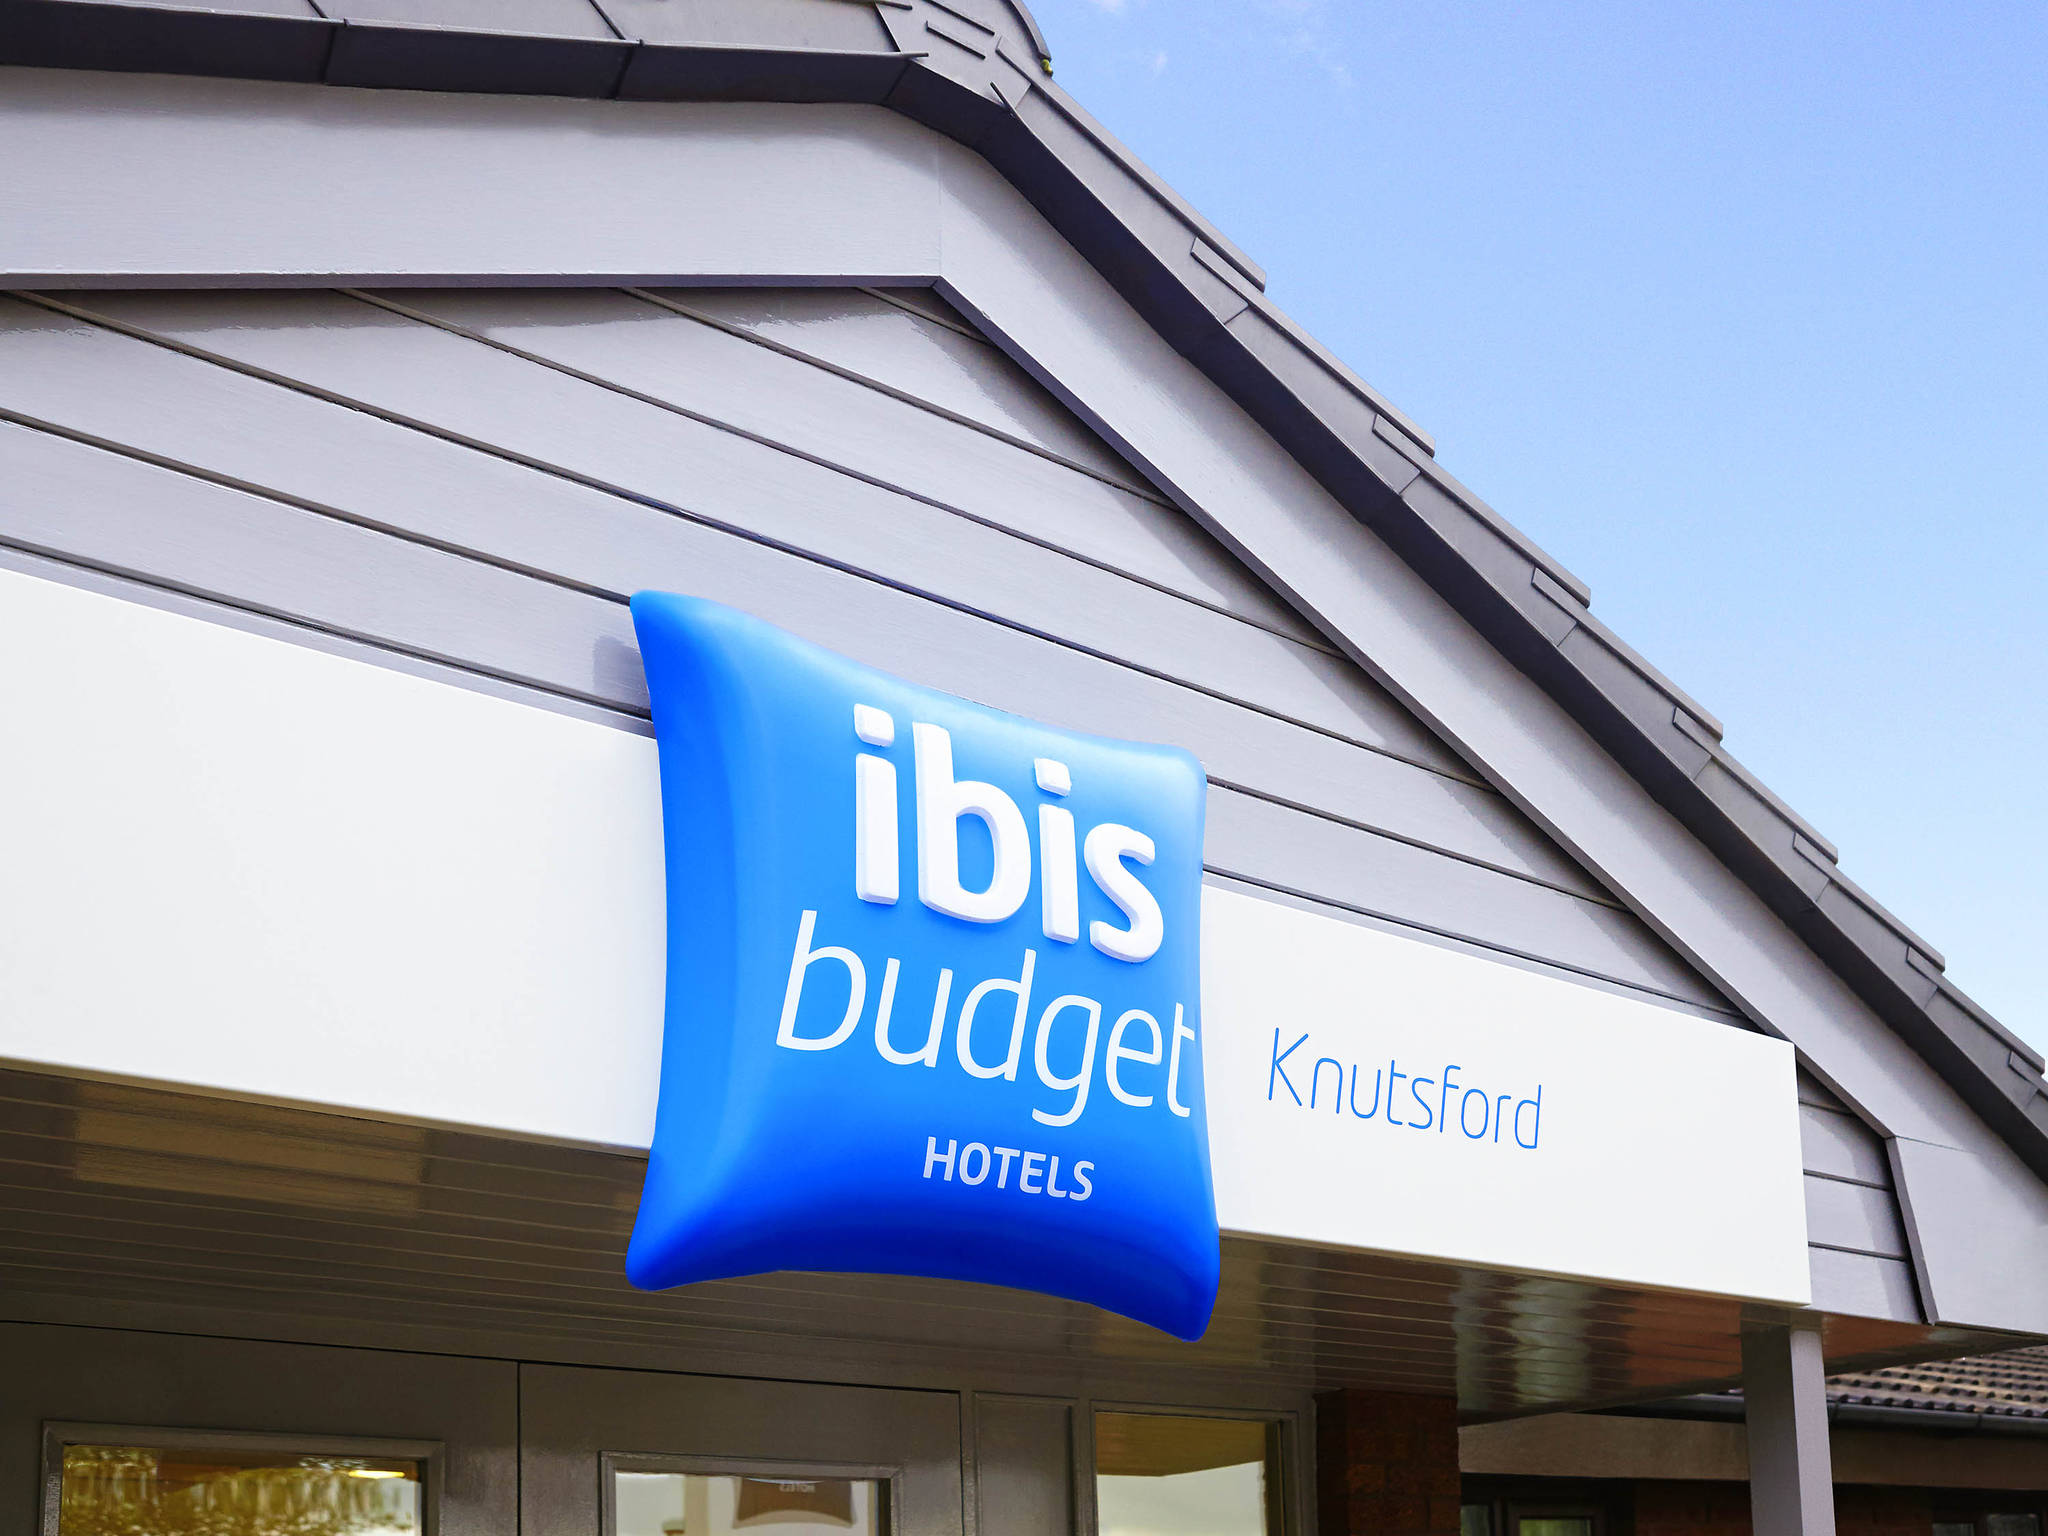 فندق - ibis budget Knutsford